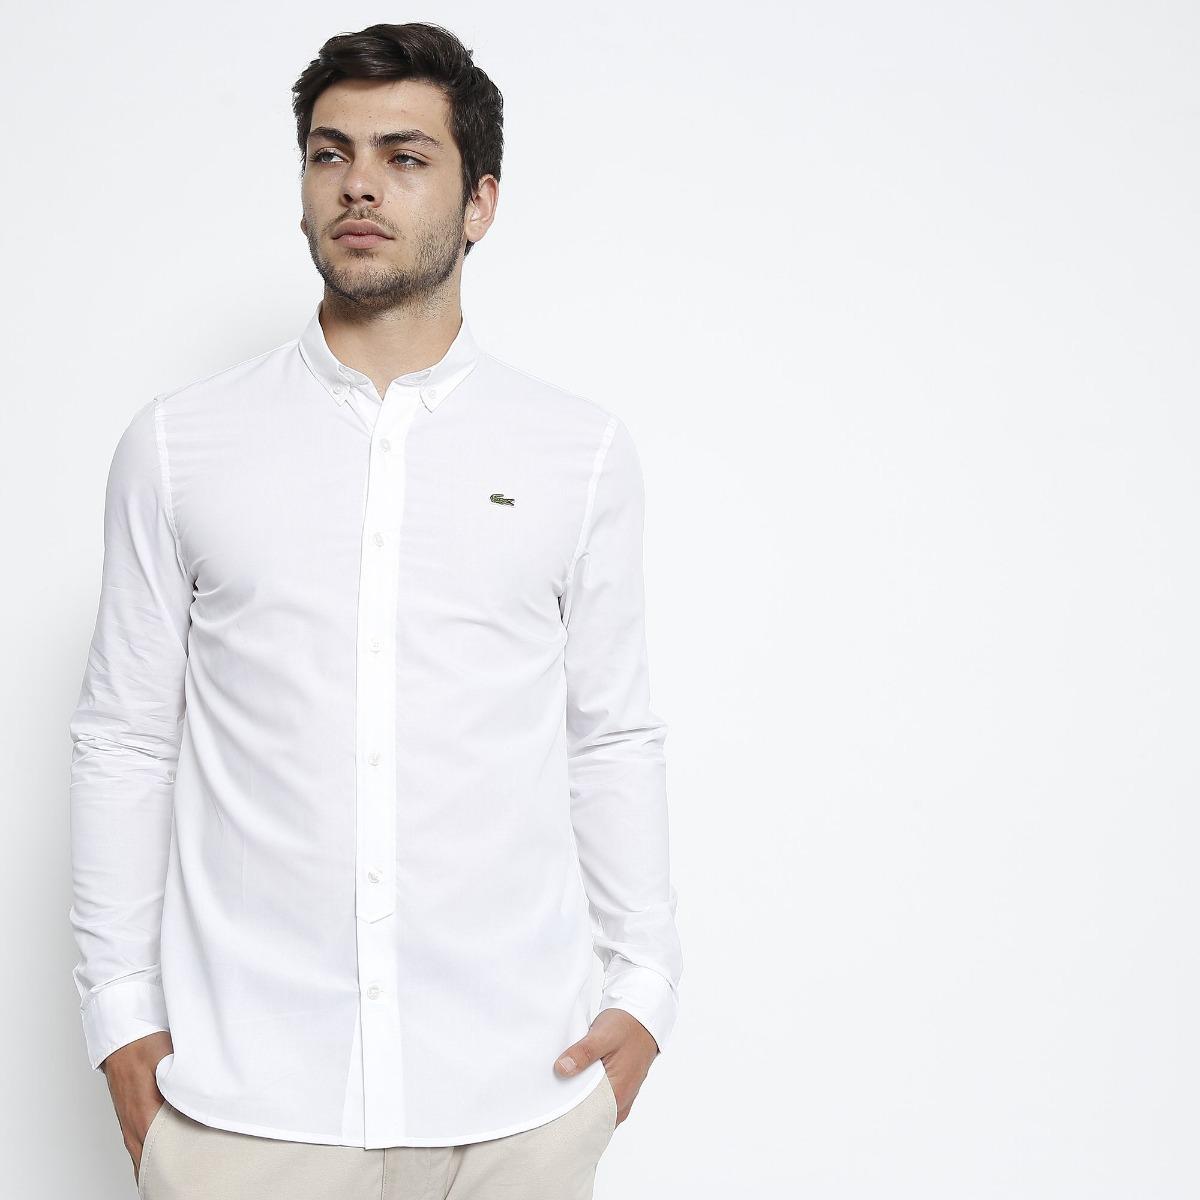 camisa social lacoste masculina slim fit bordado - branca. Carregando zoom. 60e3cafbac